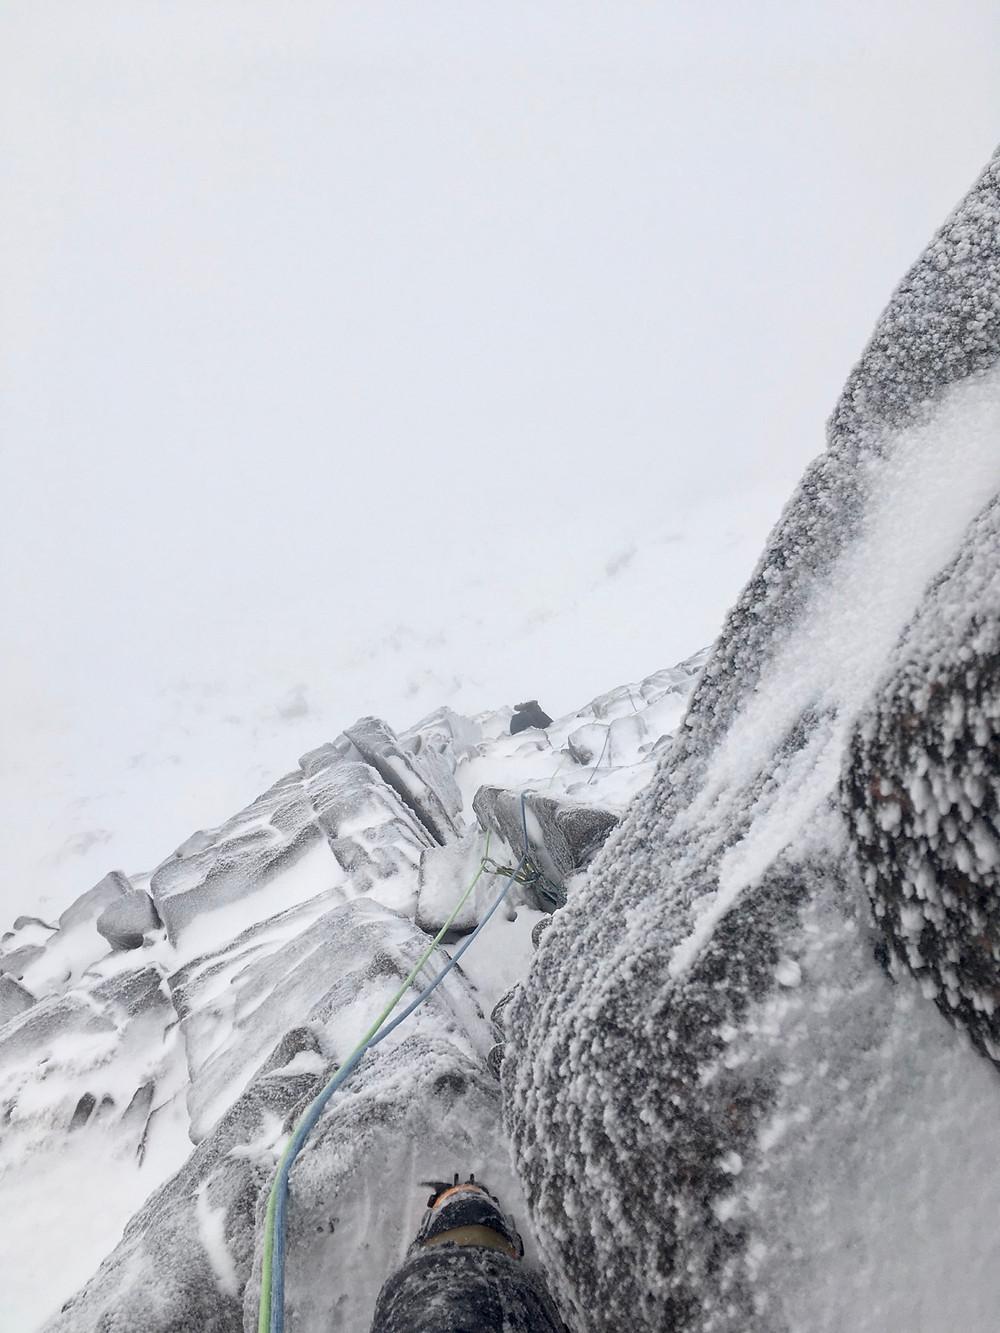 Winter climbing Pygmy ridge, Cairngorm national park